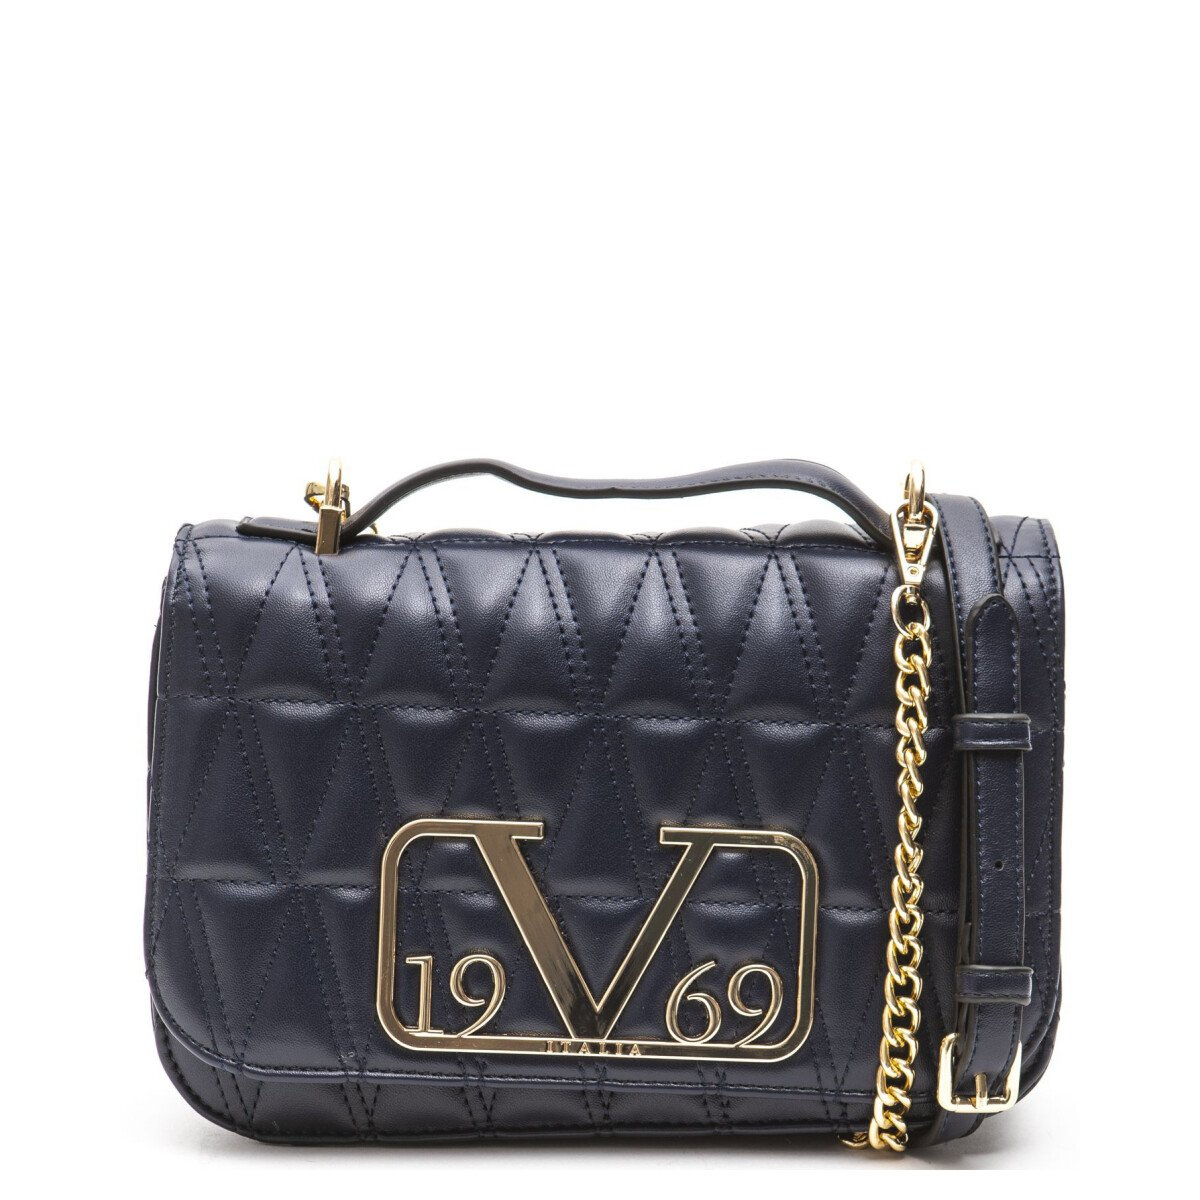 19v69 Italia Women's Shoulder Bag Various Colours 318906 - blue UNICA